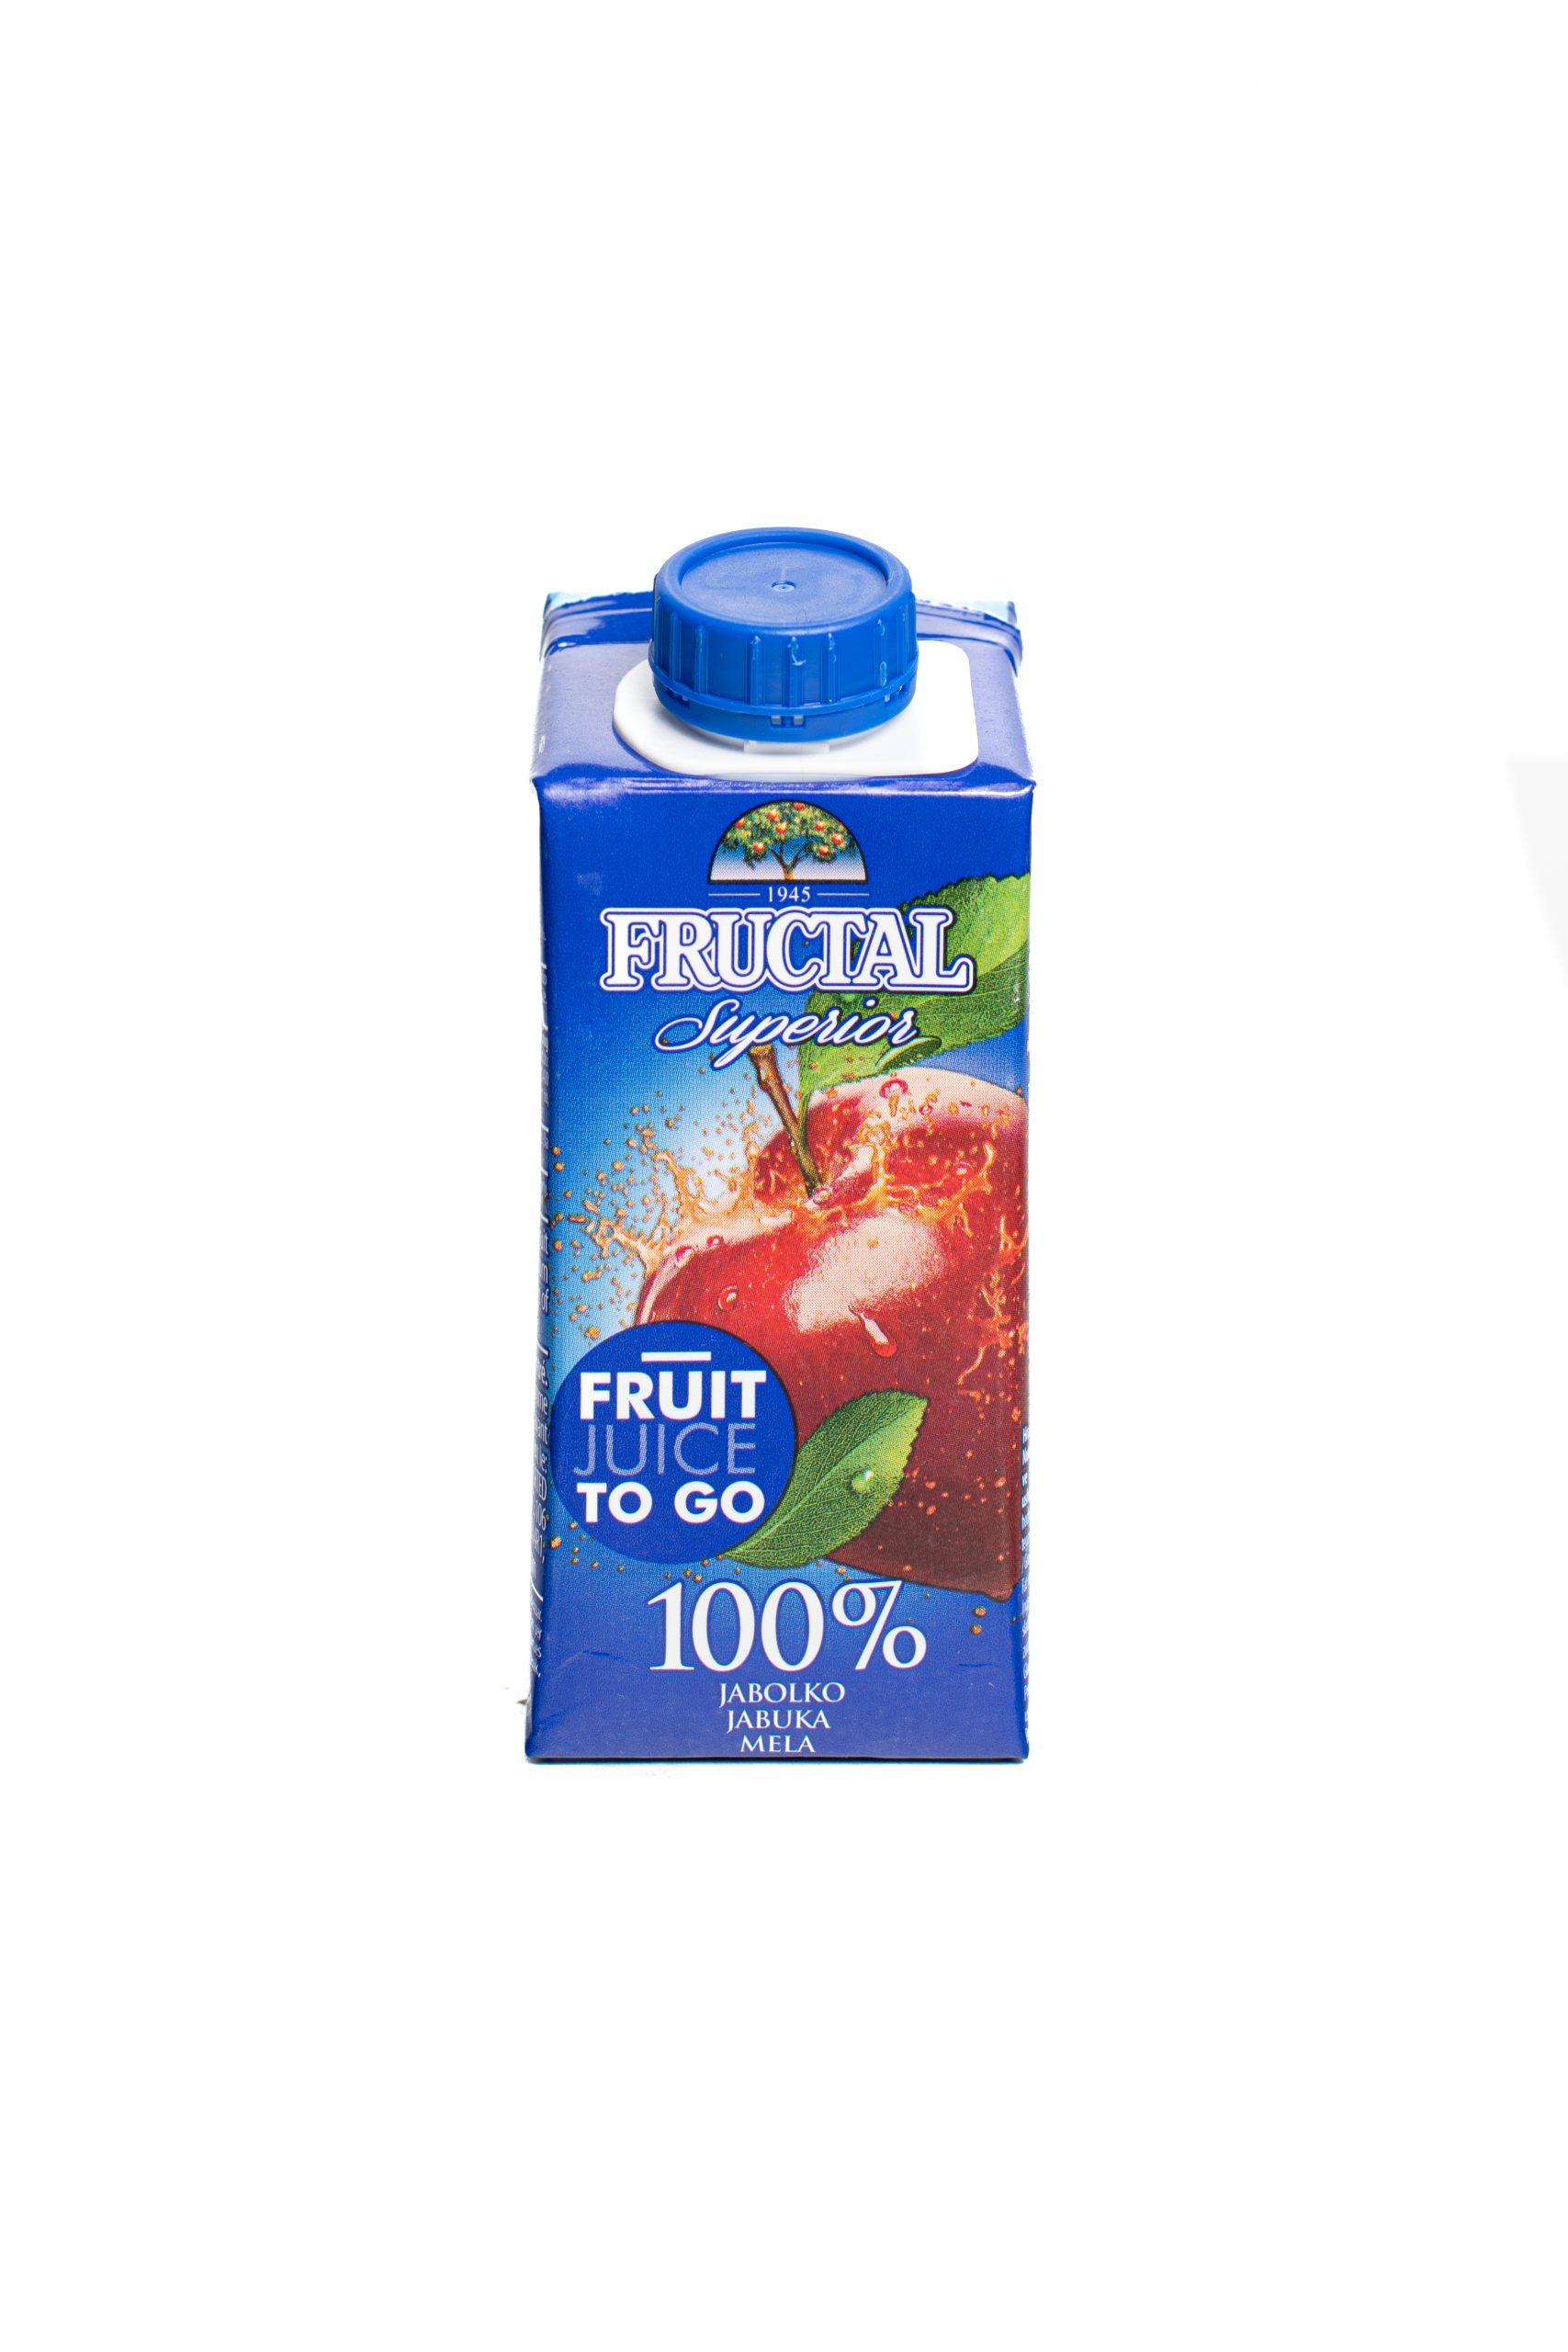 Fructal Tetra Edge | 200 ml | Apple